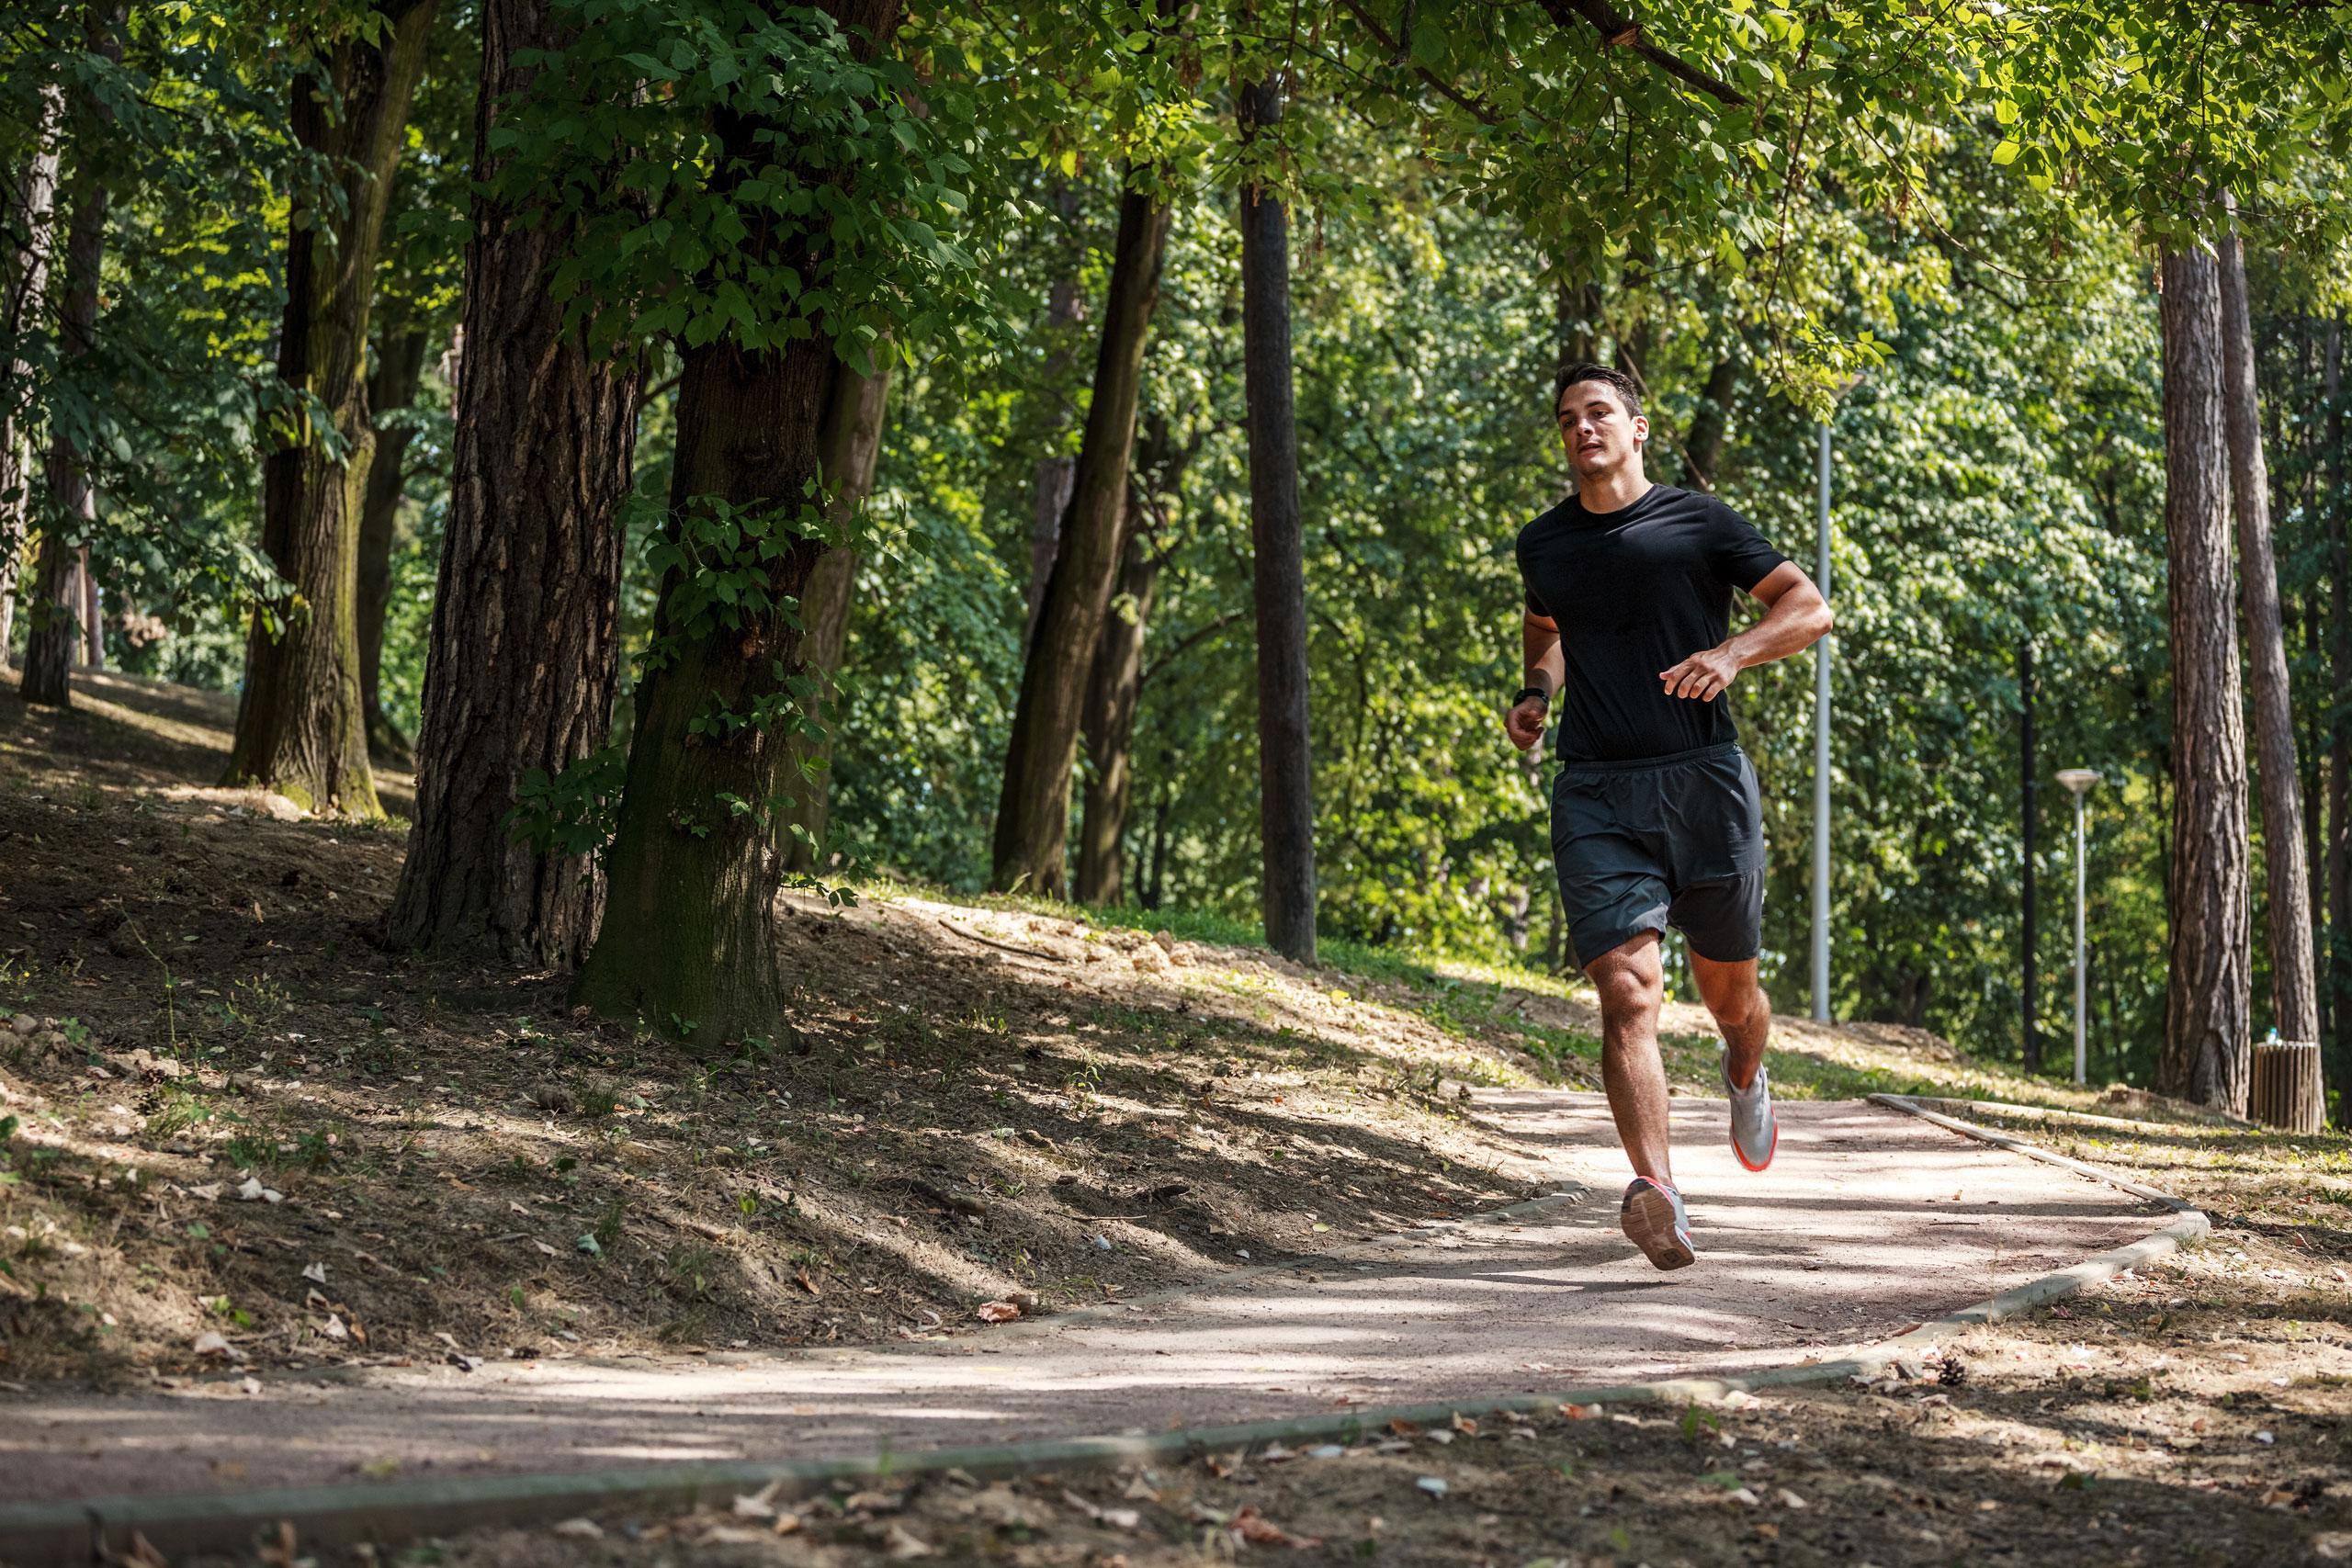 The Fenley Man Running